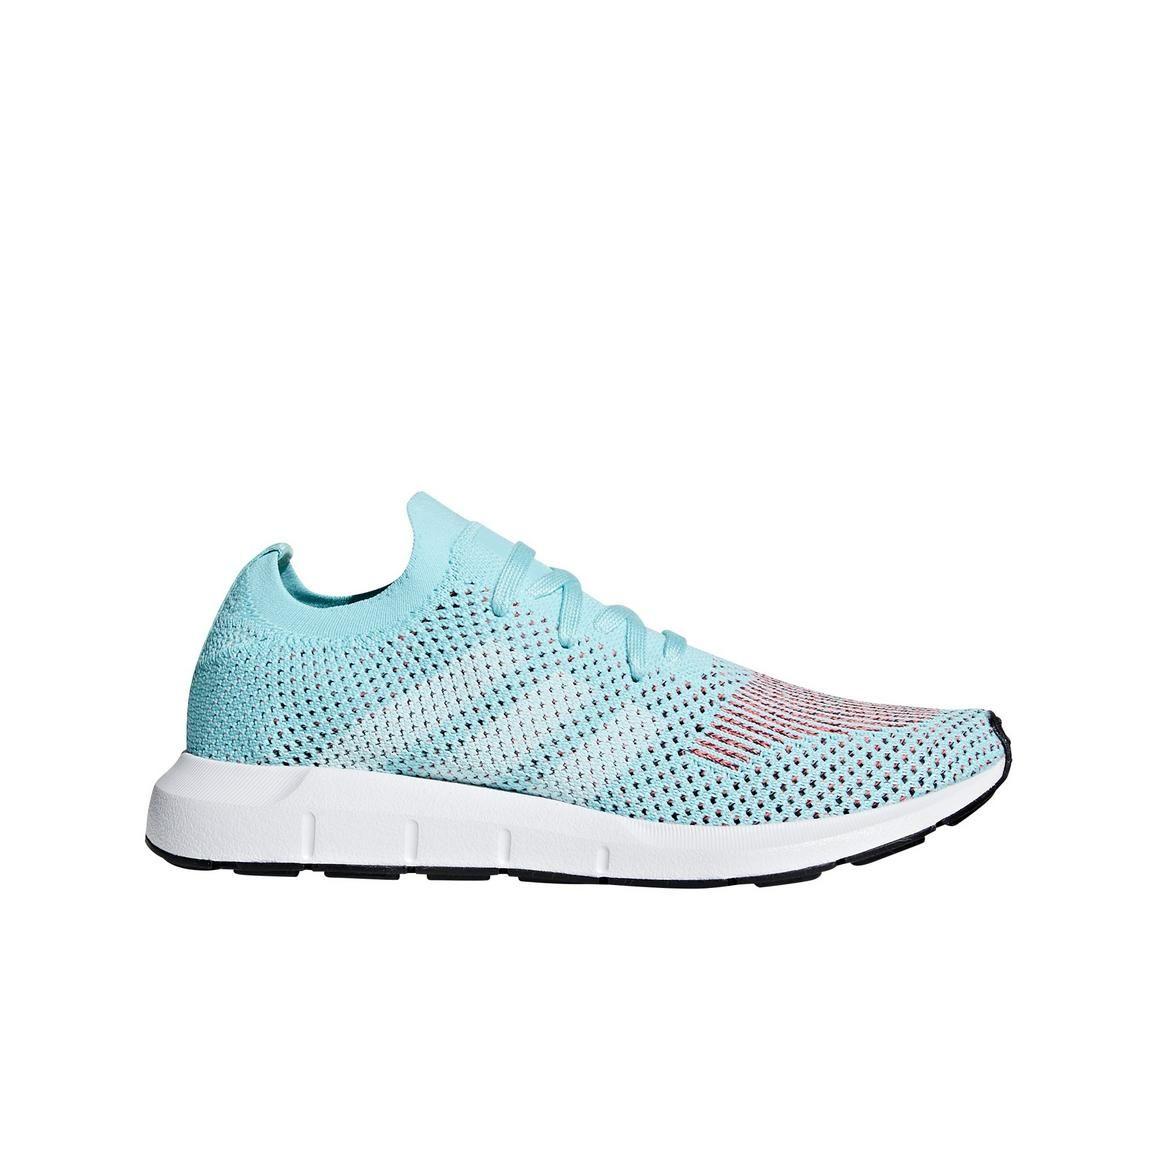 "adidas Swift Run Primeknit ""Clear Aqua"" Women's Shoe"